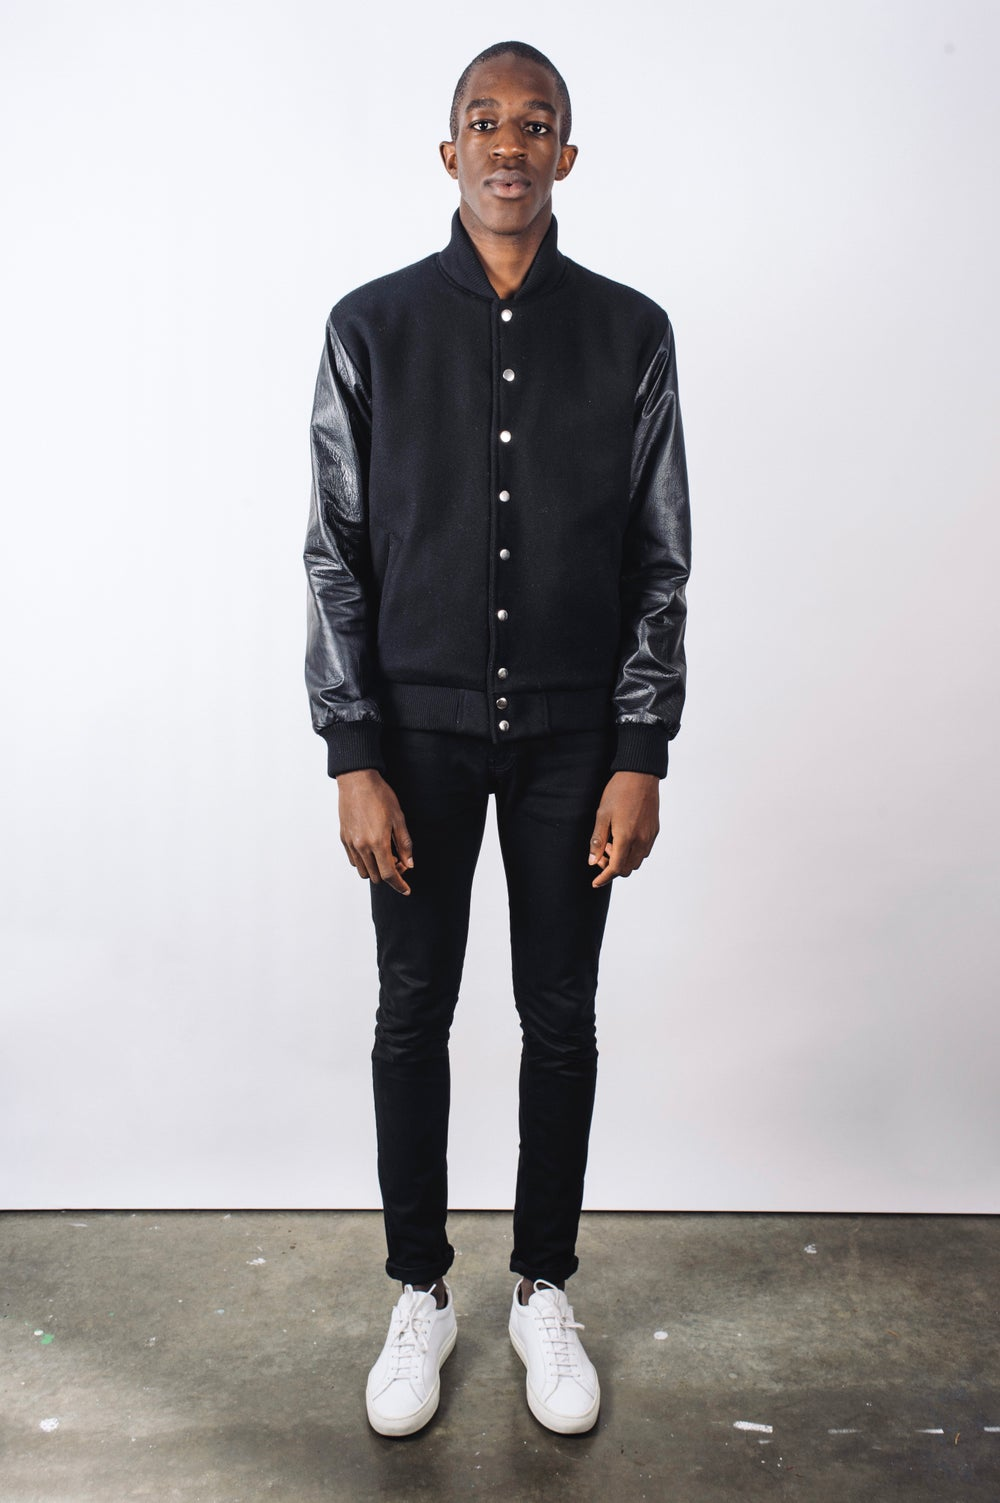 Image of Black Sleeved Cashmere/Wool Varsity